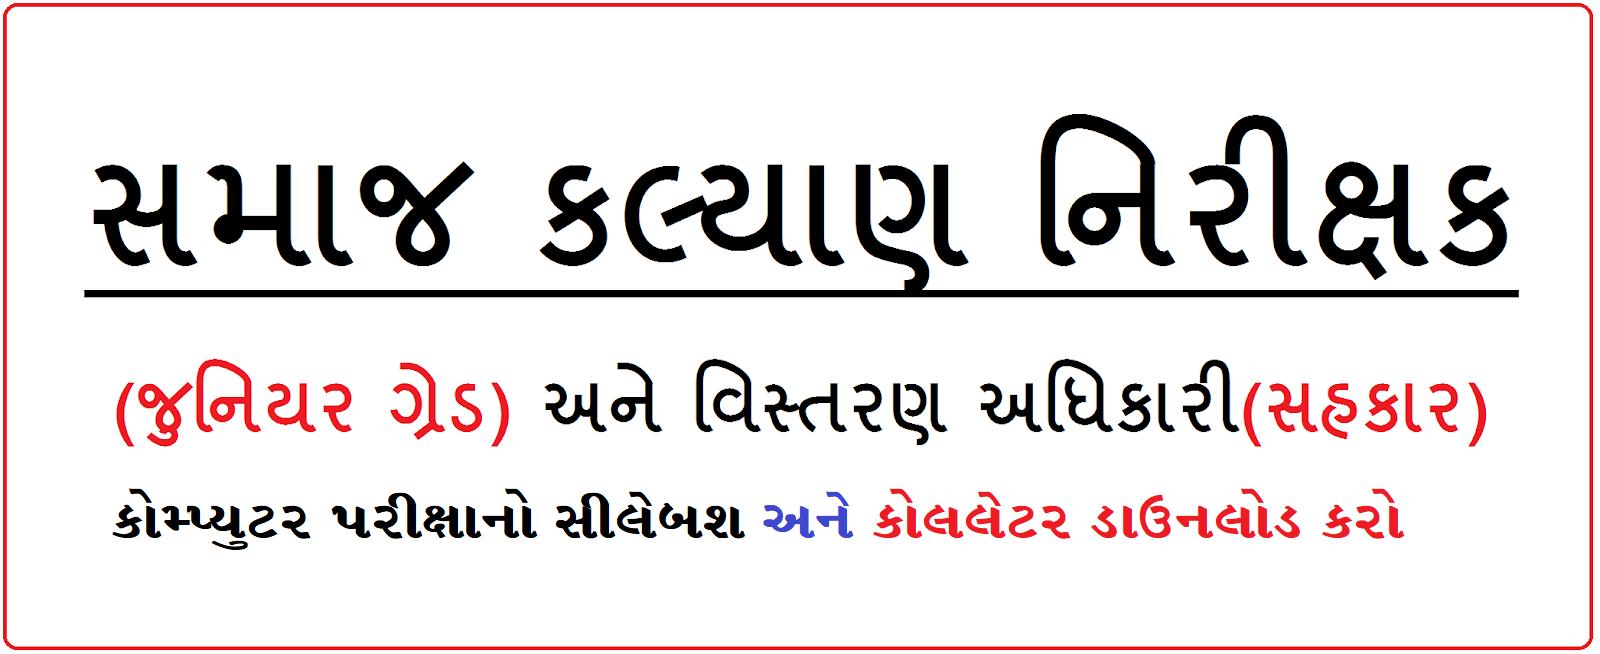 GPSSB Samaj Kalyan Adhikari Computer Exam Syllabus & Call Letter 2019